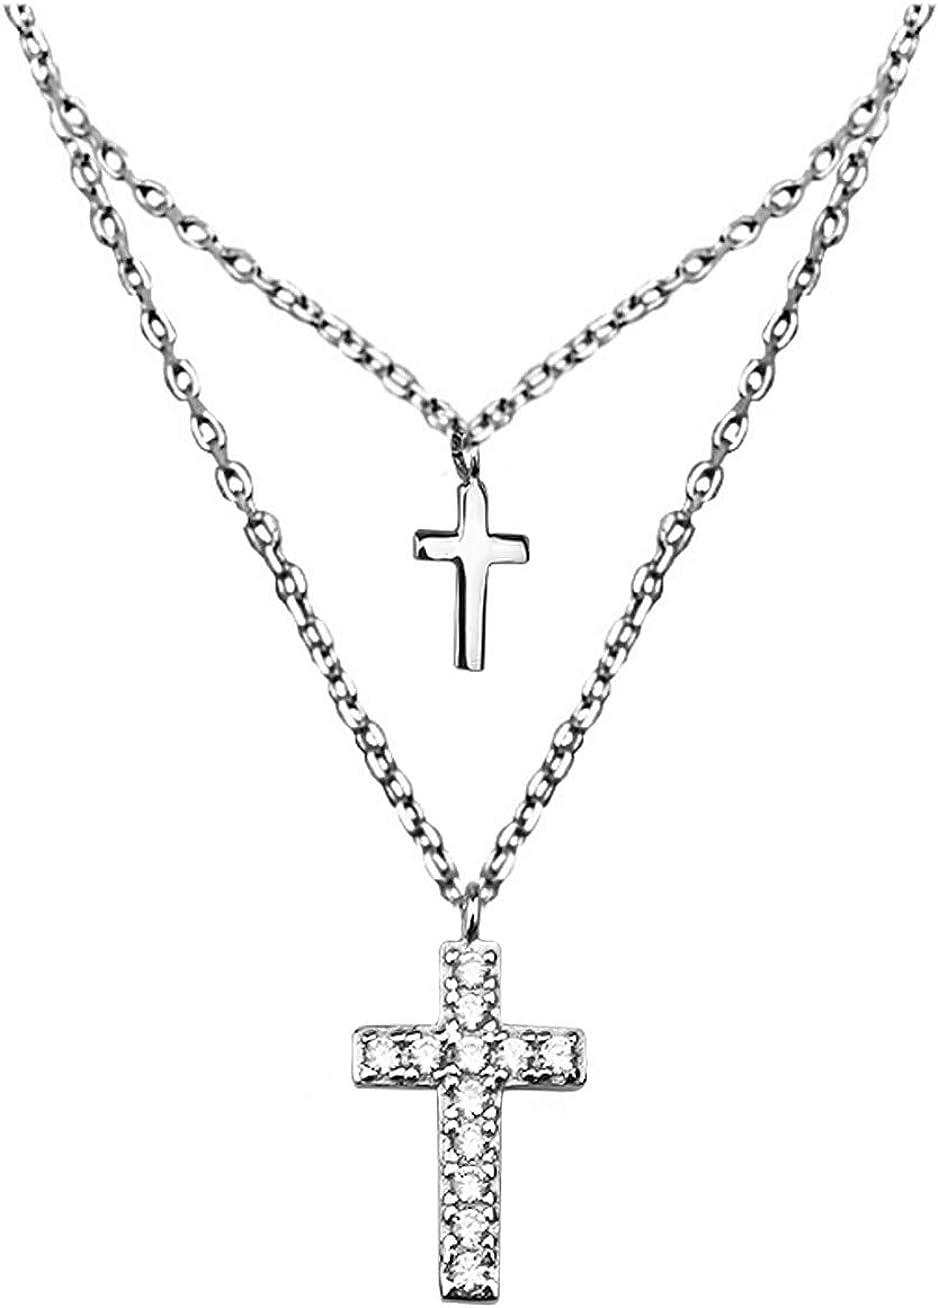 SOFIA MILANI - Women's Ranking TOP20 Necklace Silver Stone with 925 Superlatite Zirconia